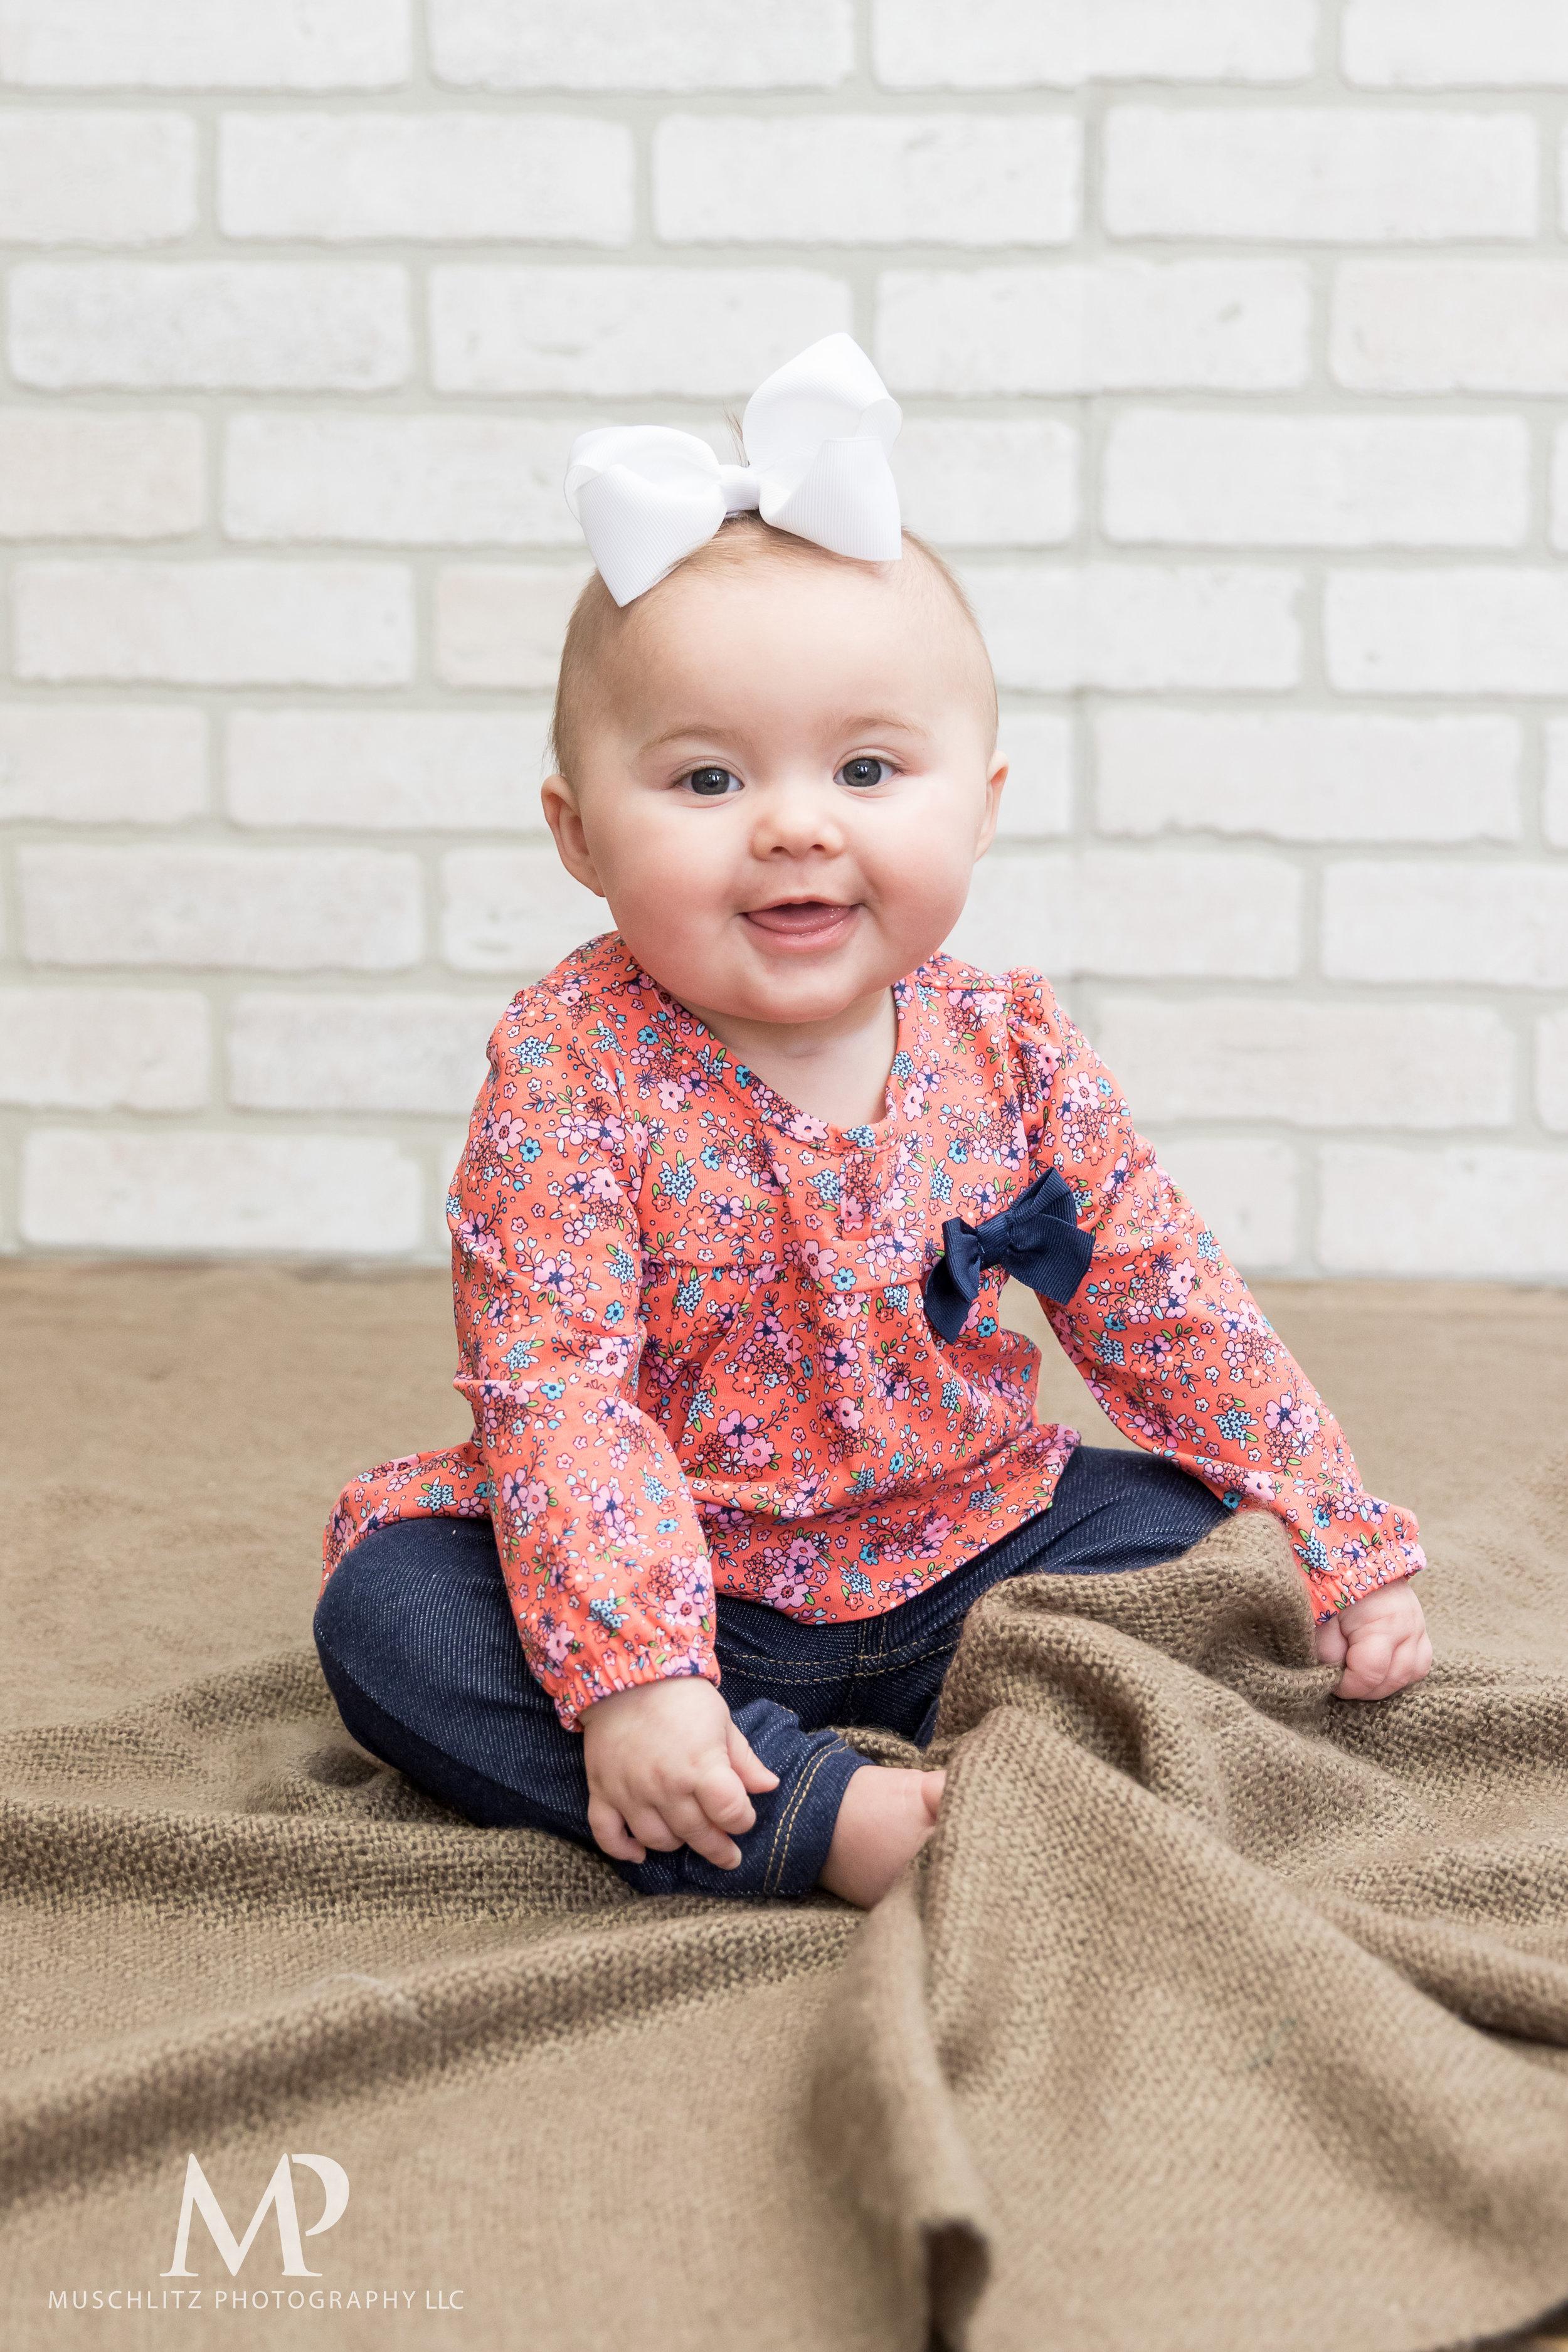 6-month-portraits-baby-photographer-columbus-ohio-gahanna-muschlitz-photography-001.JPG